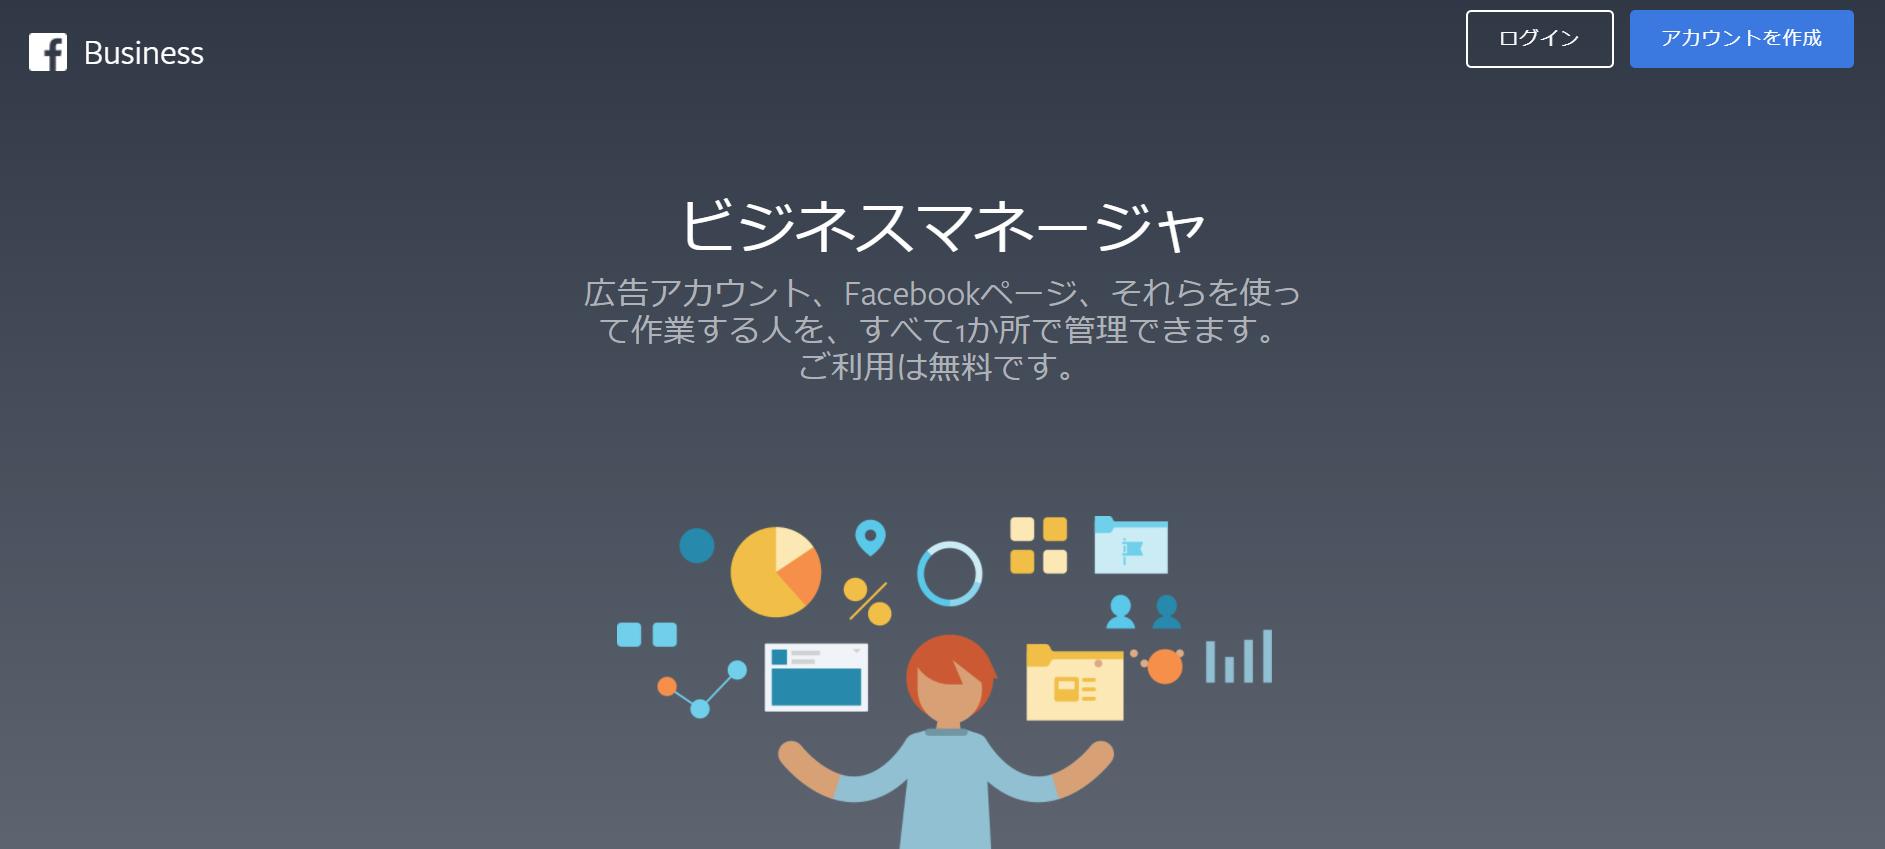 facebook-business-manager-1